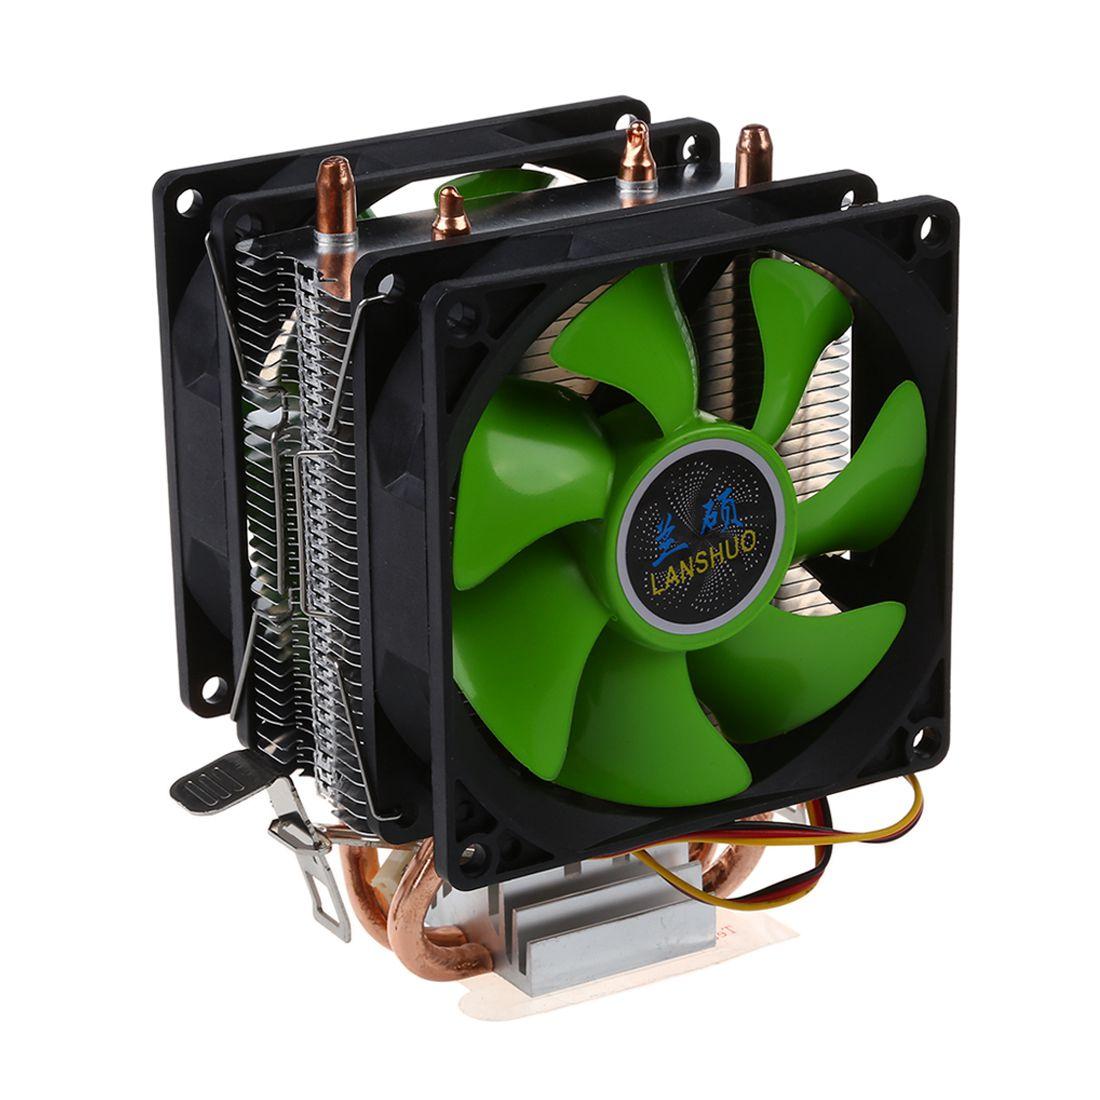 CPU kühler Silent Lüfter Für Intel LGA775/1156/1155 AMD AM2/AM2 +/AM3